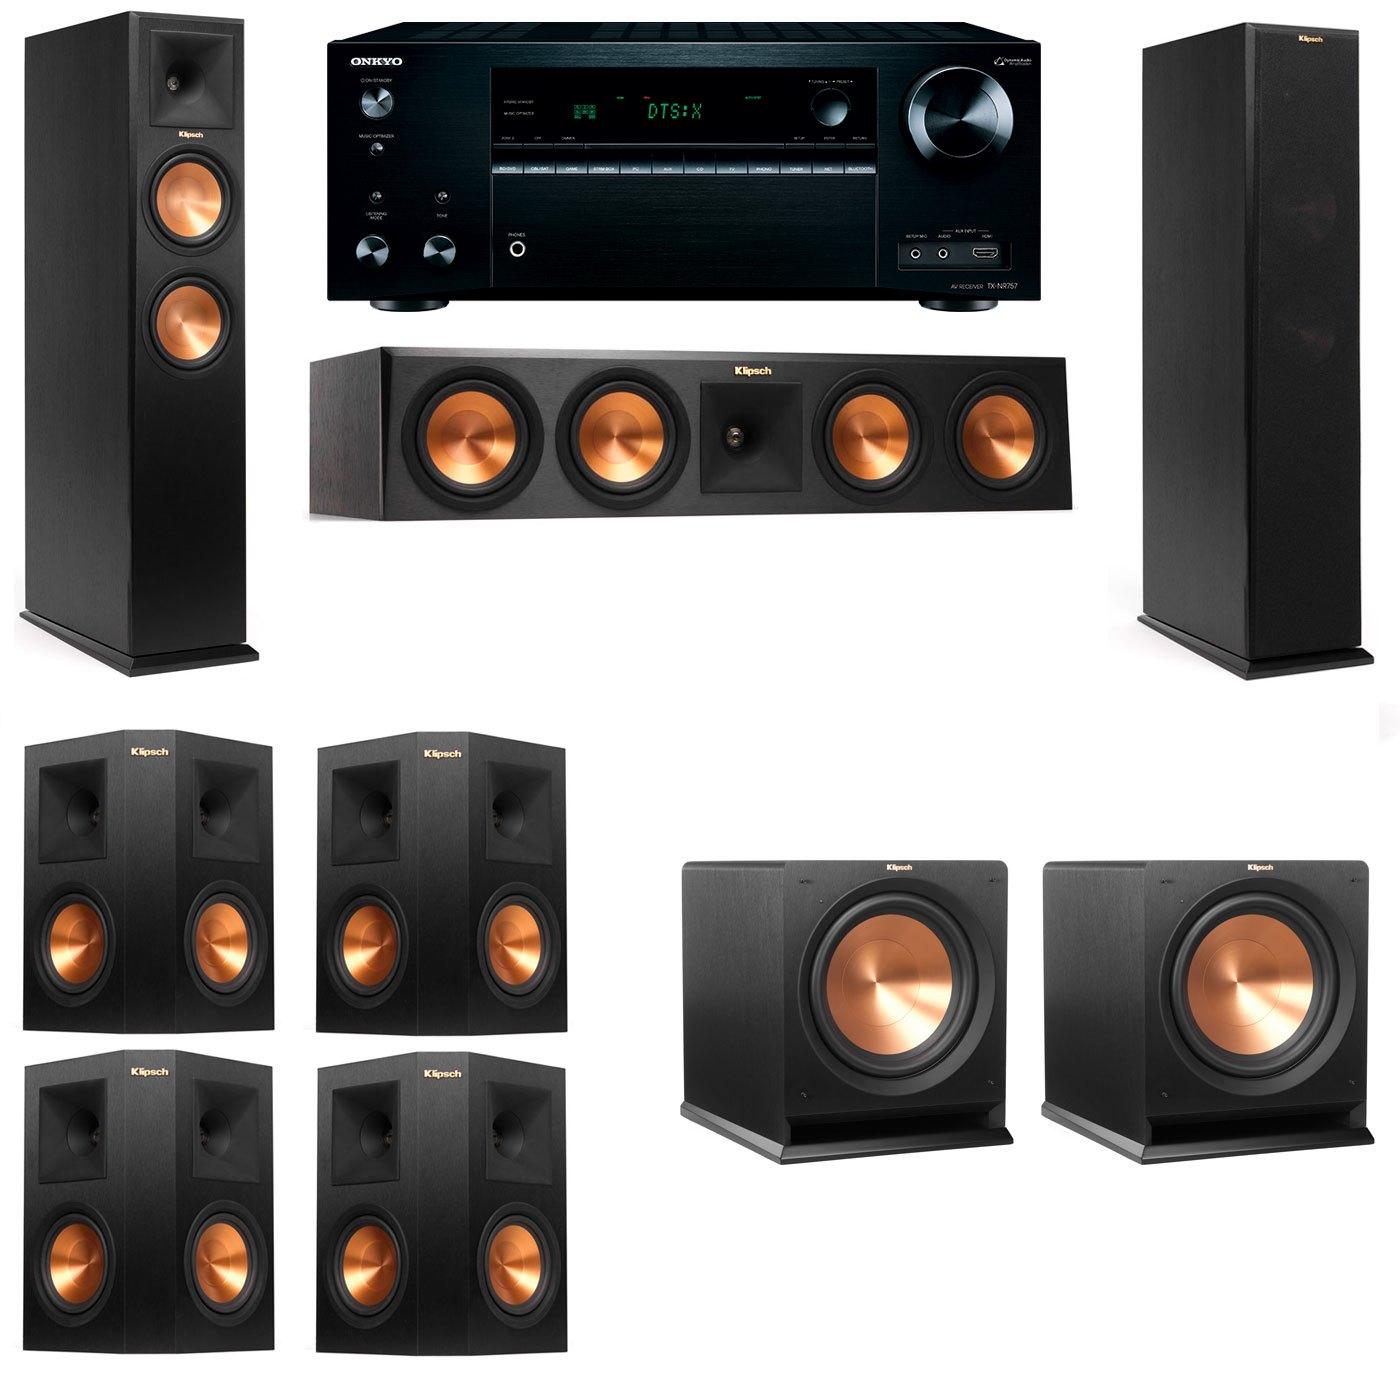 Klipsch RP-250F Tower Speakers-R112SW-7.2-Onkyo TX-NR757